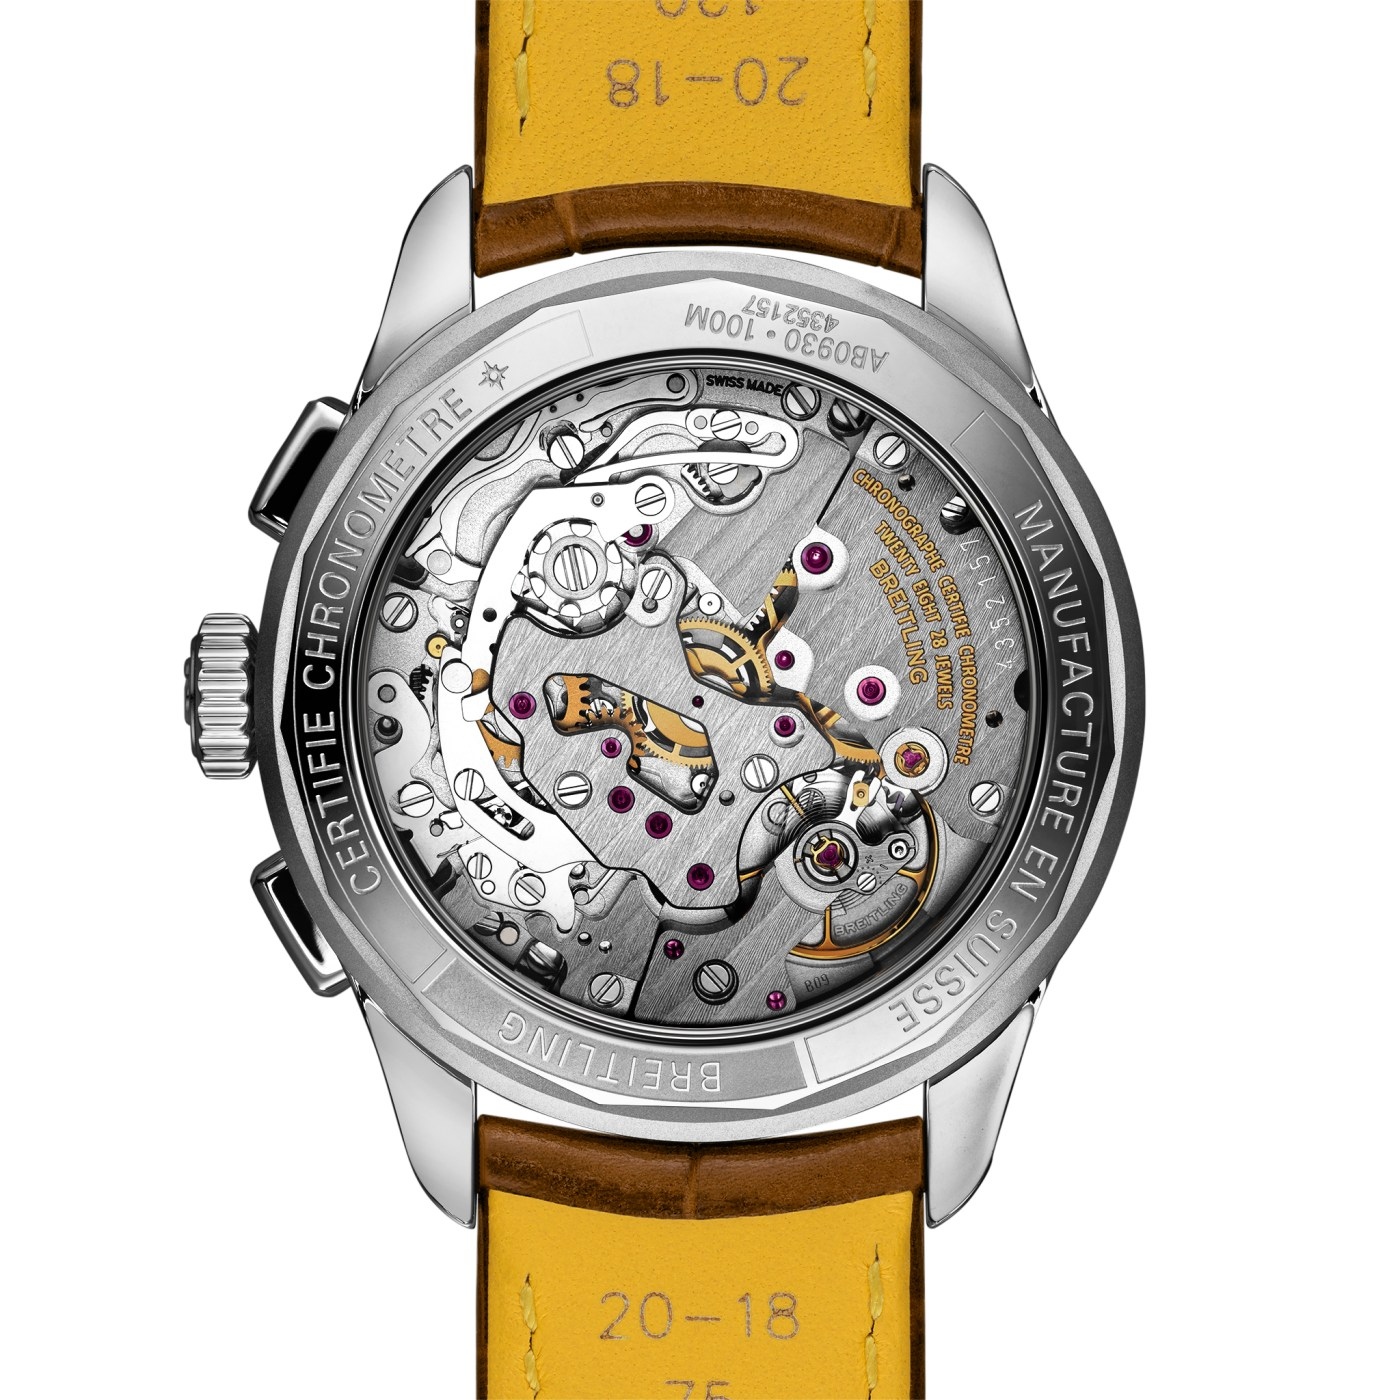 2021 Breitling Premier Heritage Chronograph caseback